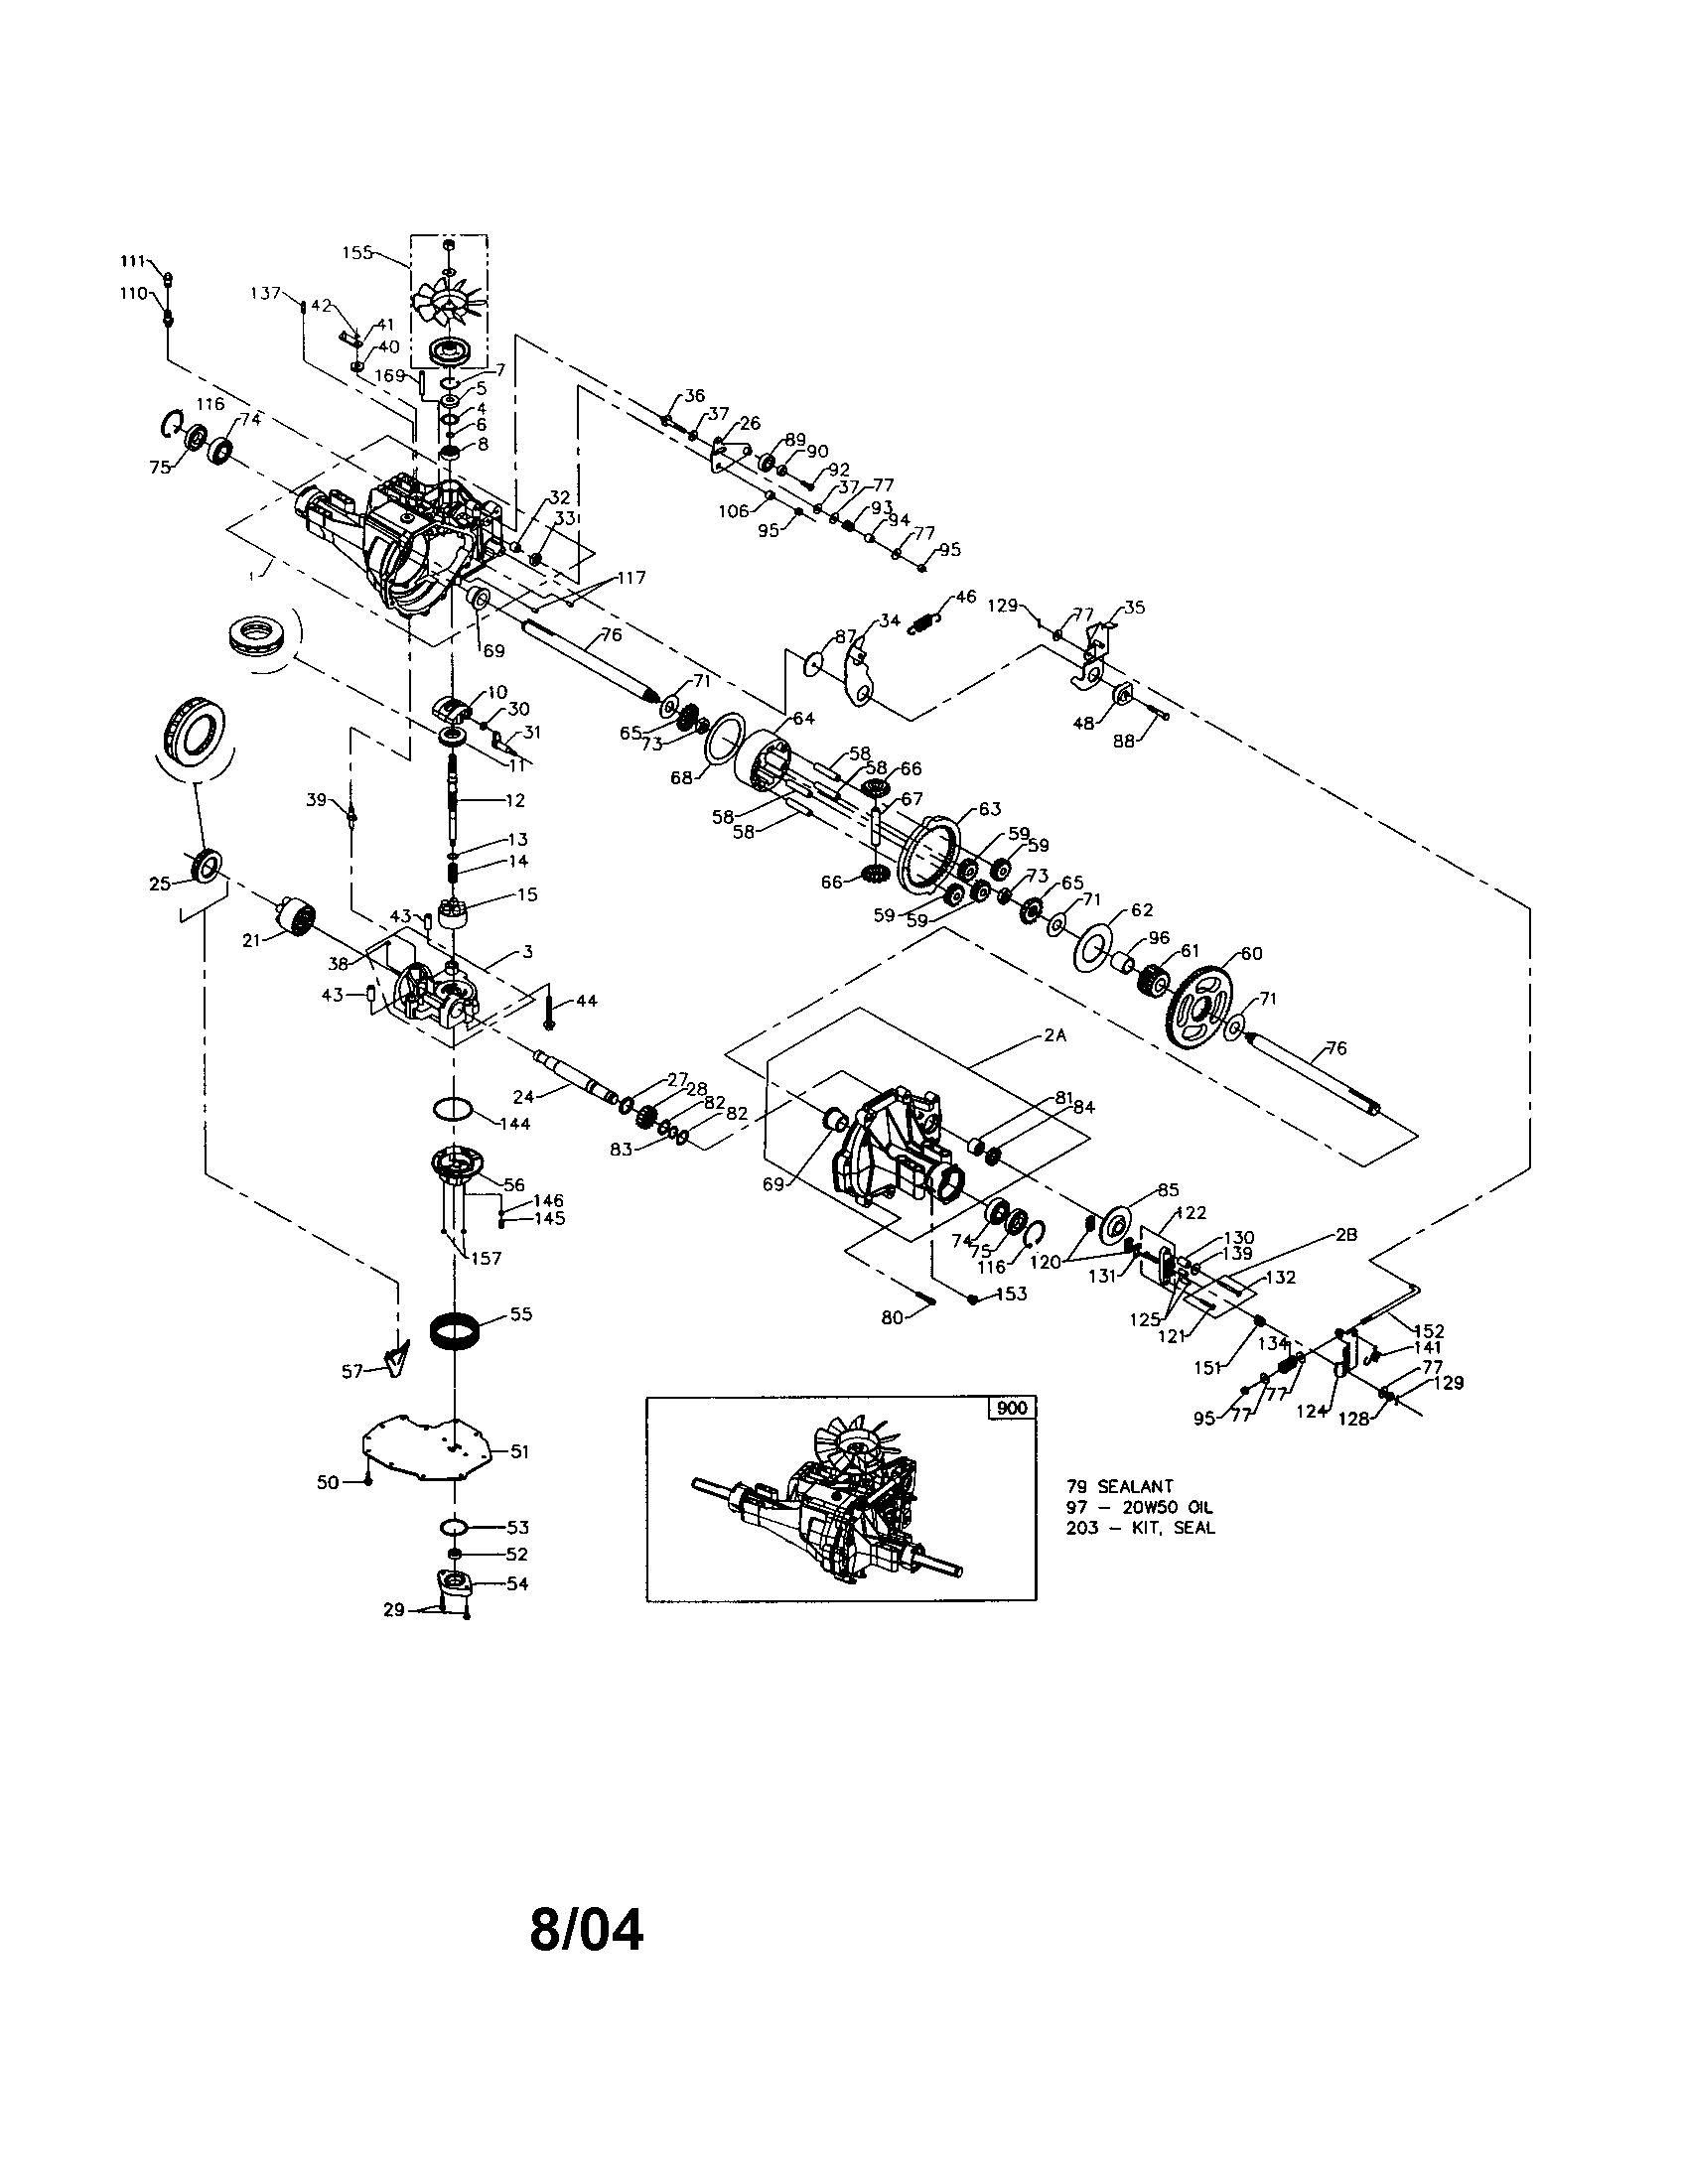 Detailed Wiring Diagram 917 Lawn Mower